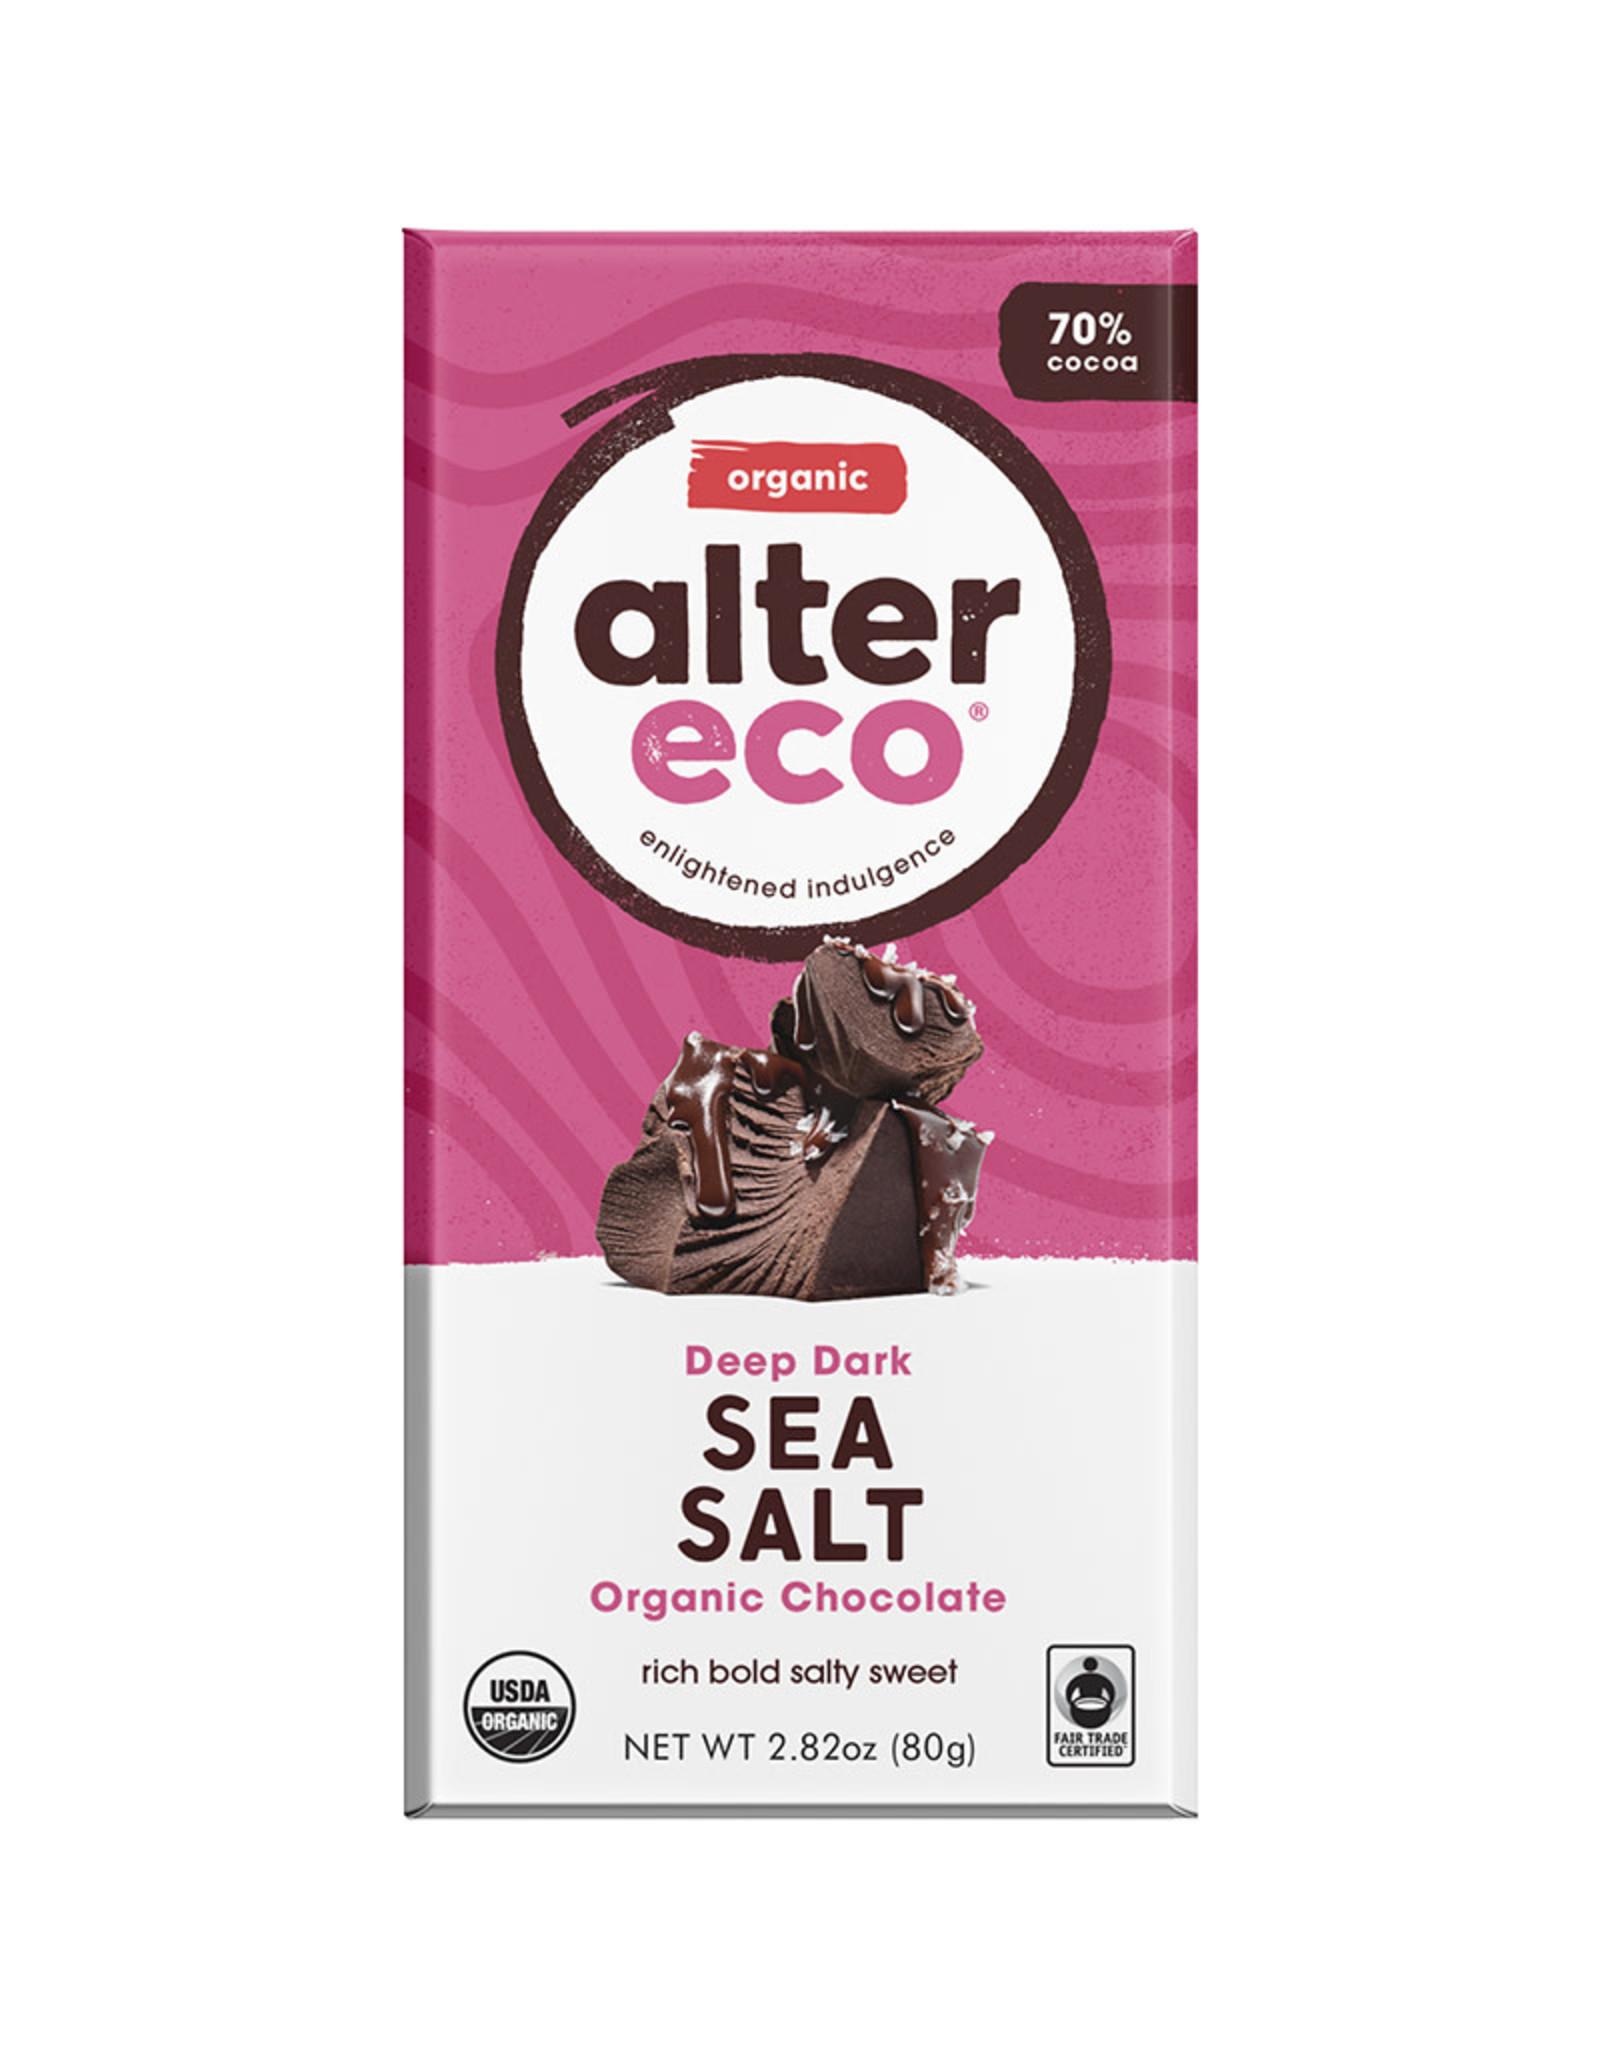 Alter Eco Alter Eco - Chocolate Bar, Dark Sea Salt